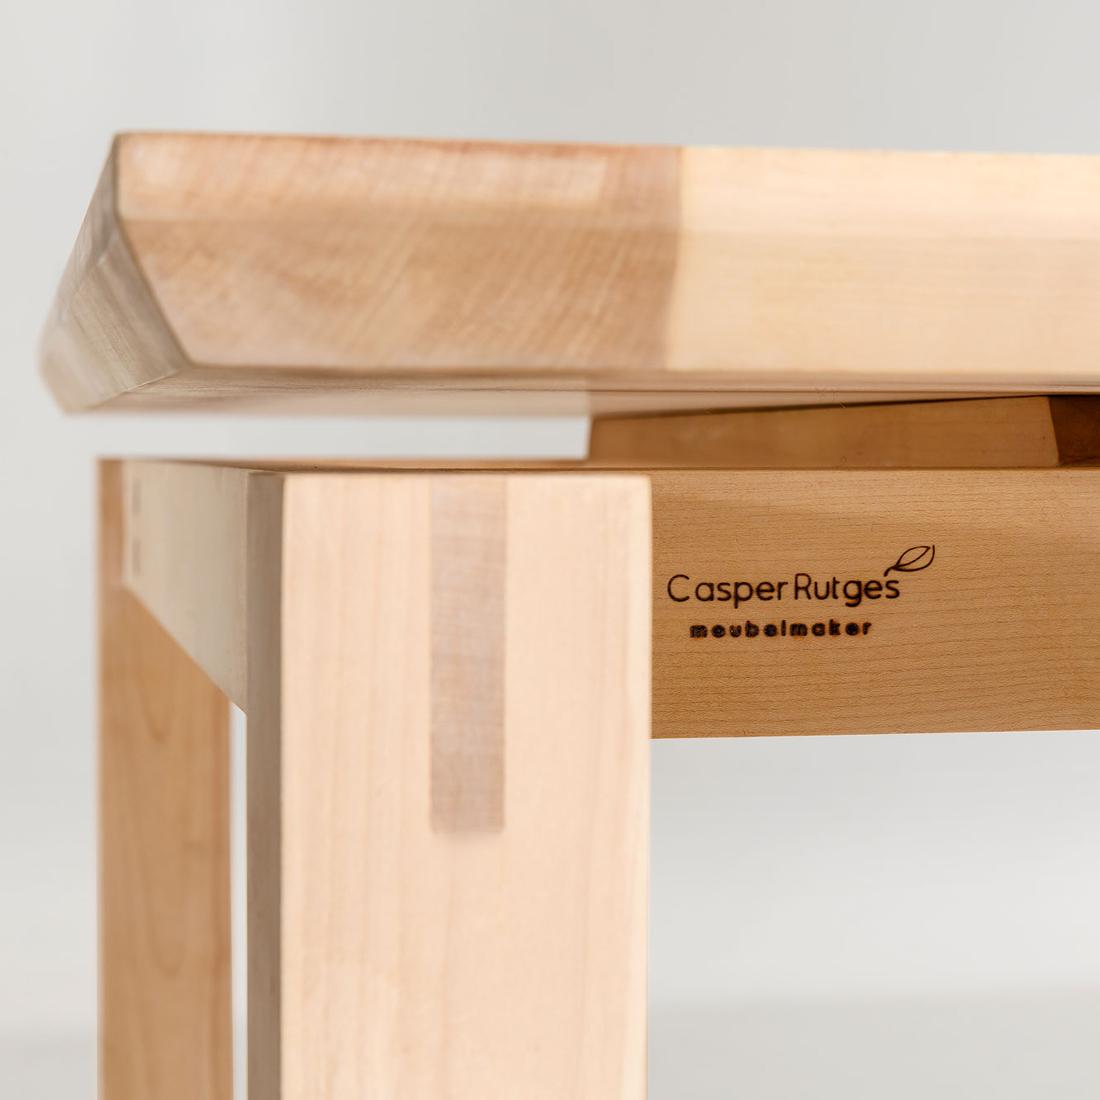 Houten meubels meubelmaker casper rutges for Houten meubels